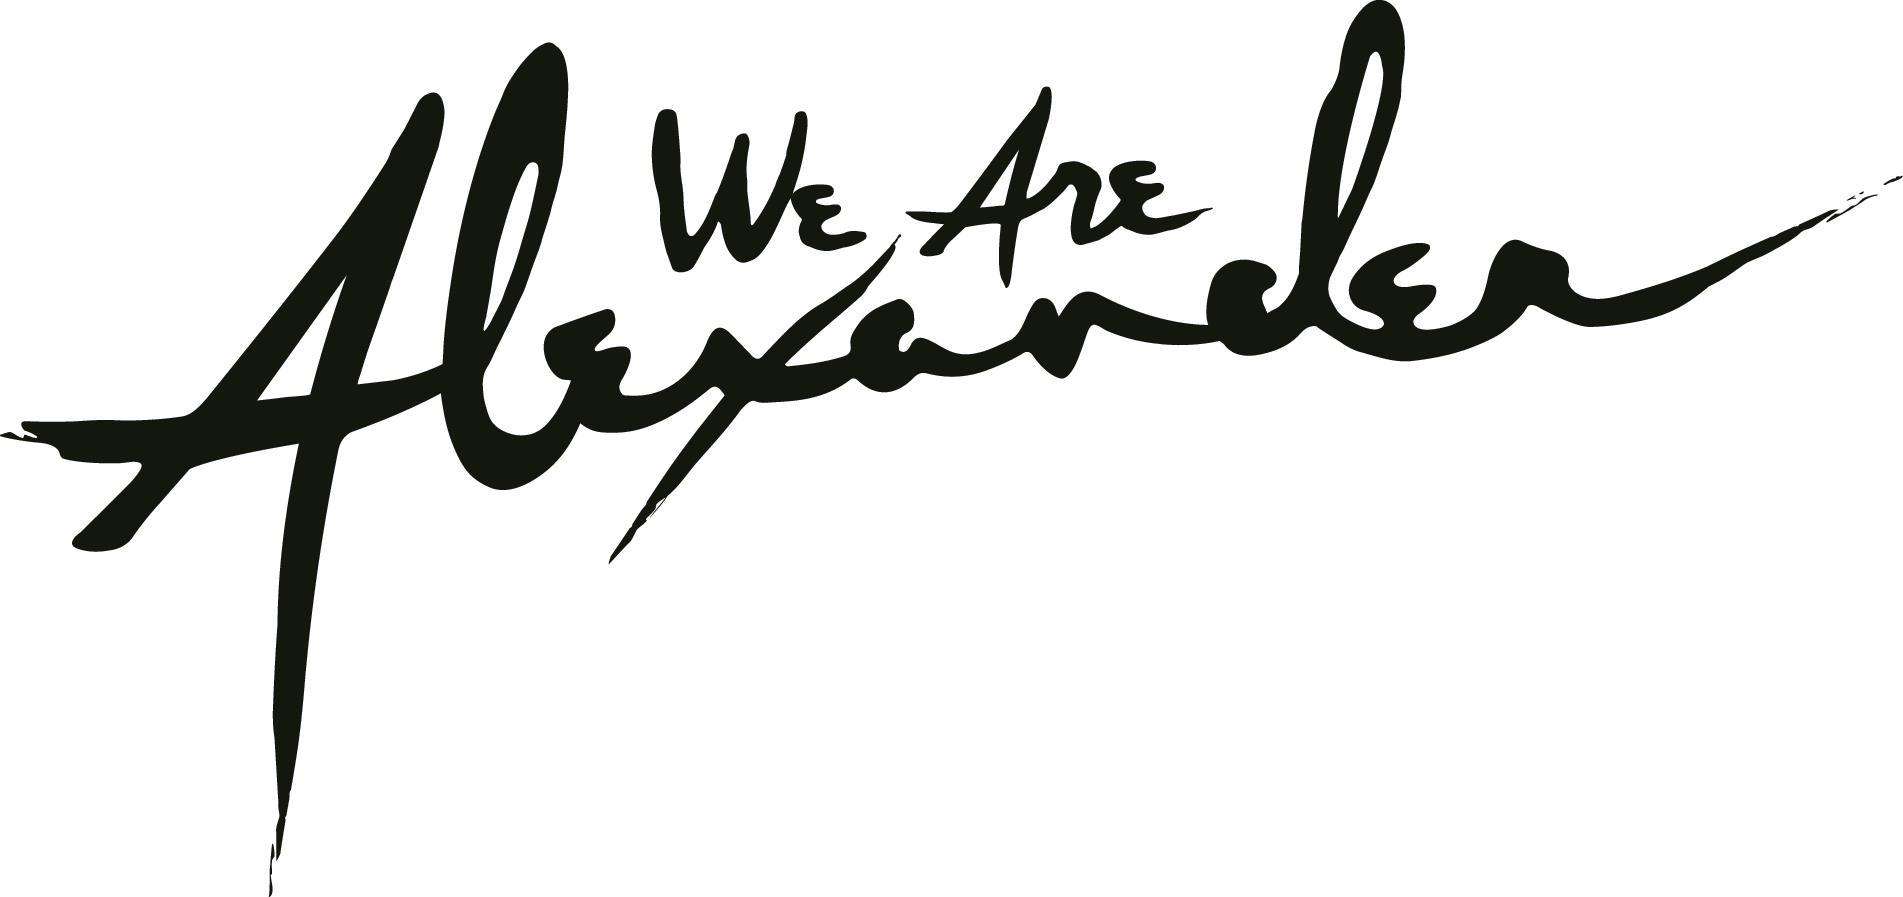 We Are Alexander